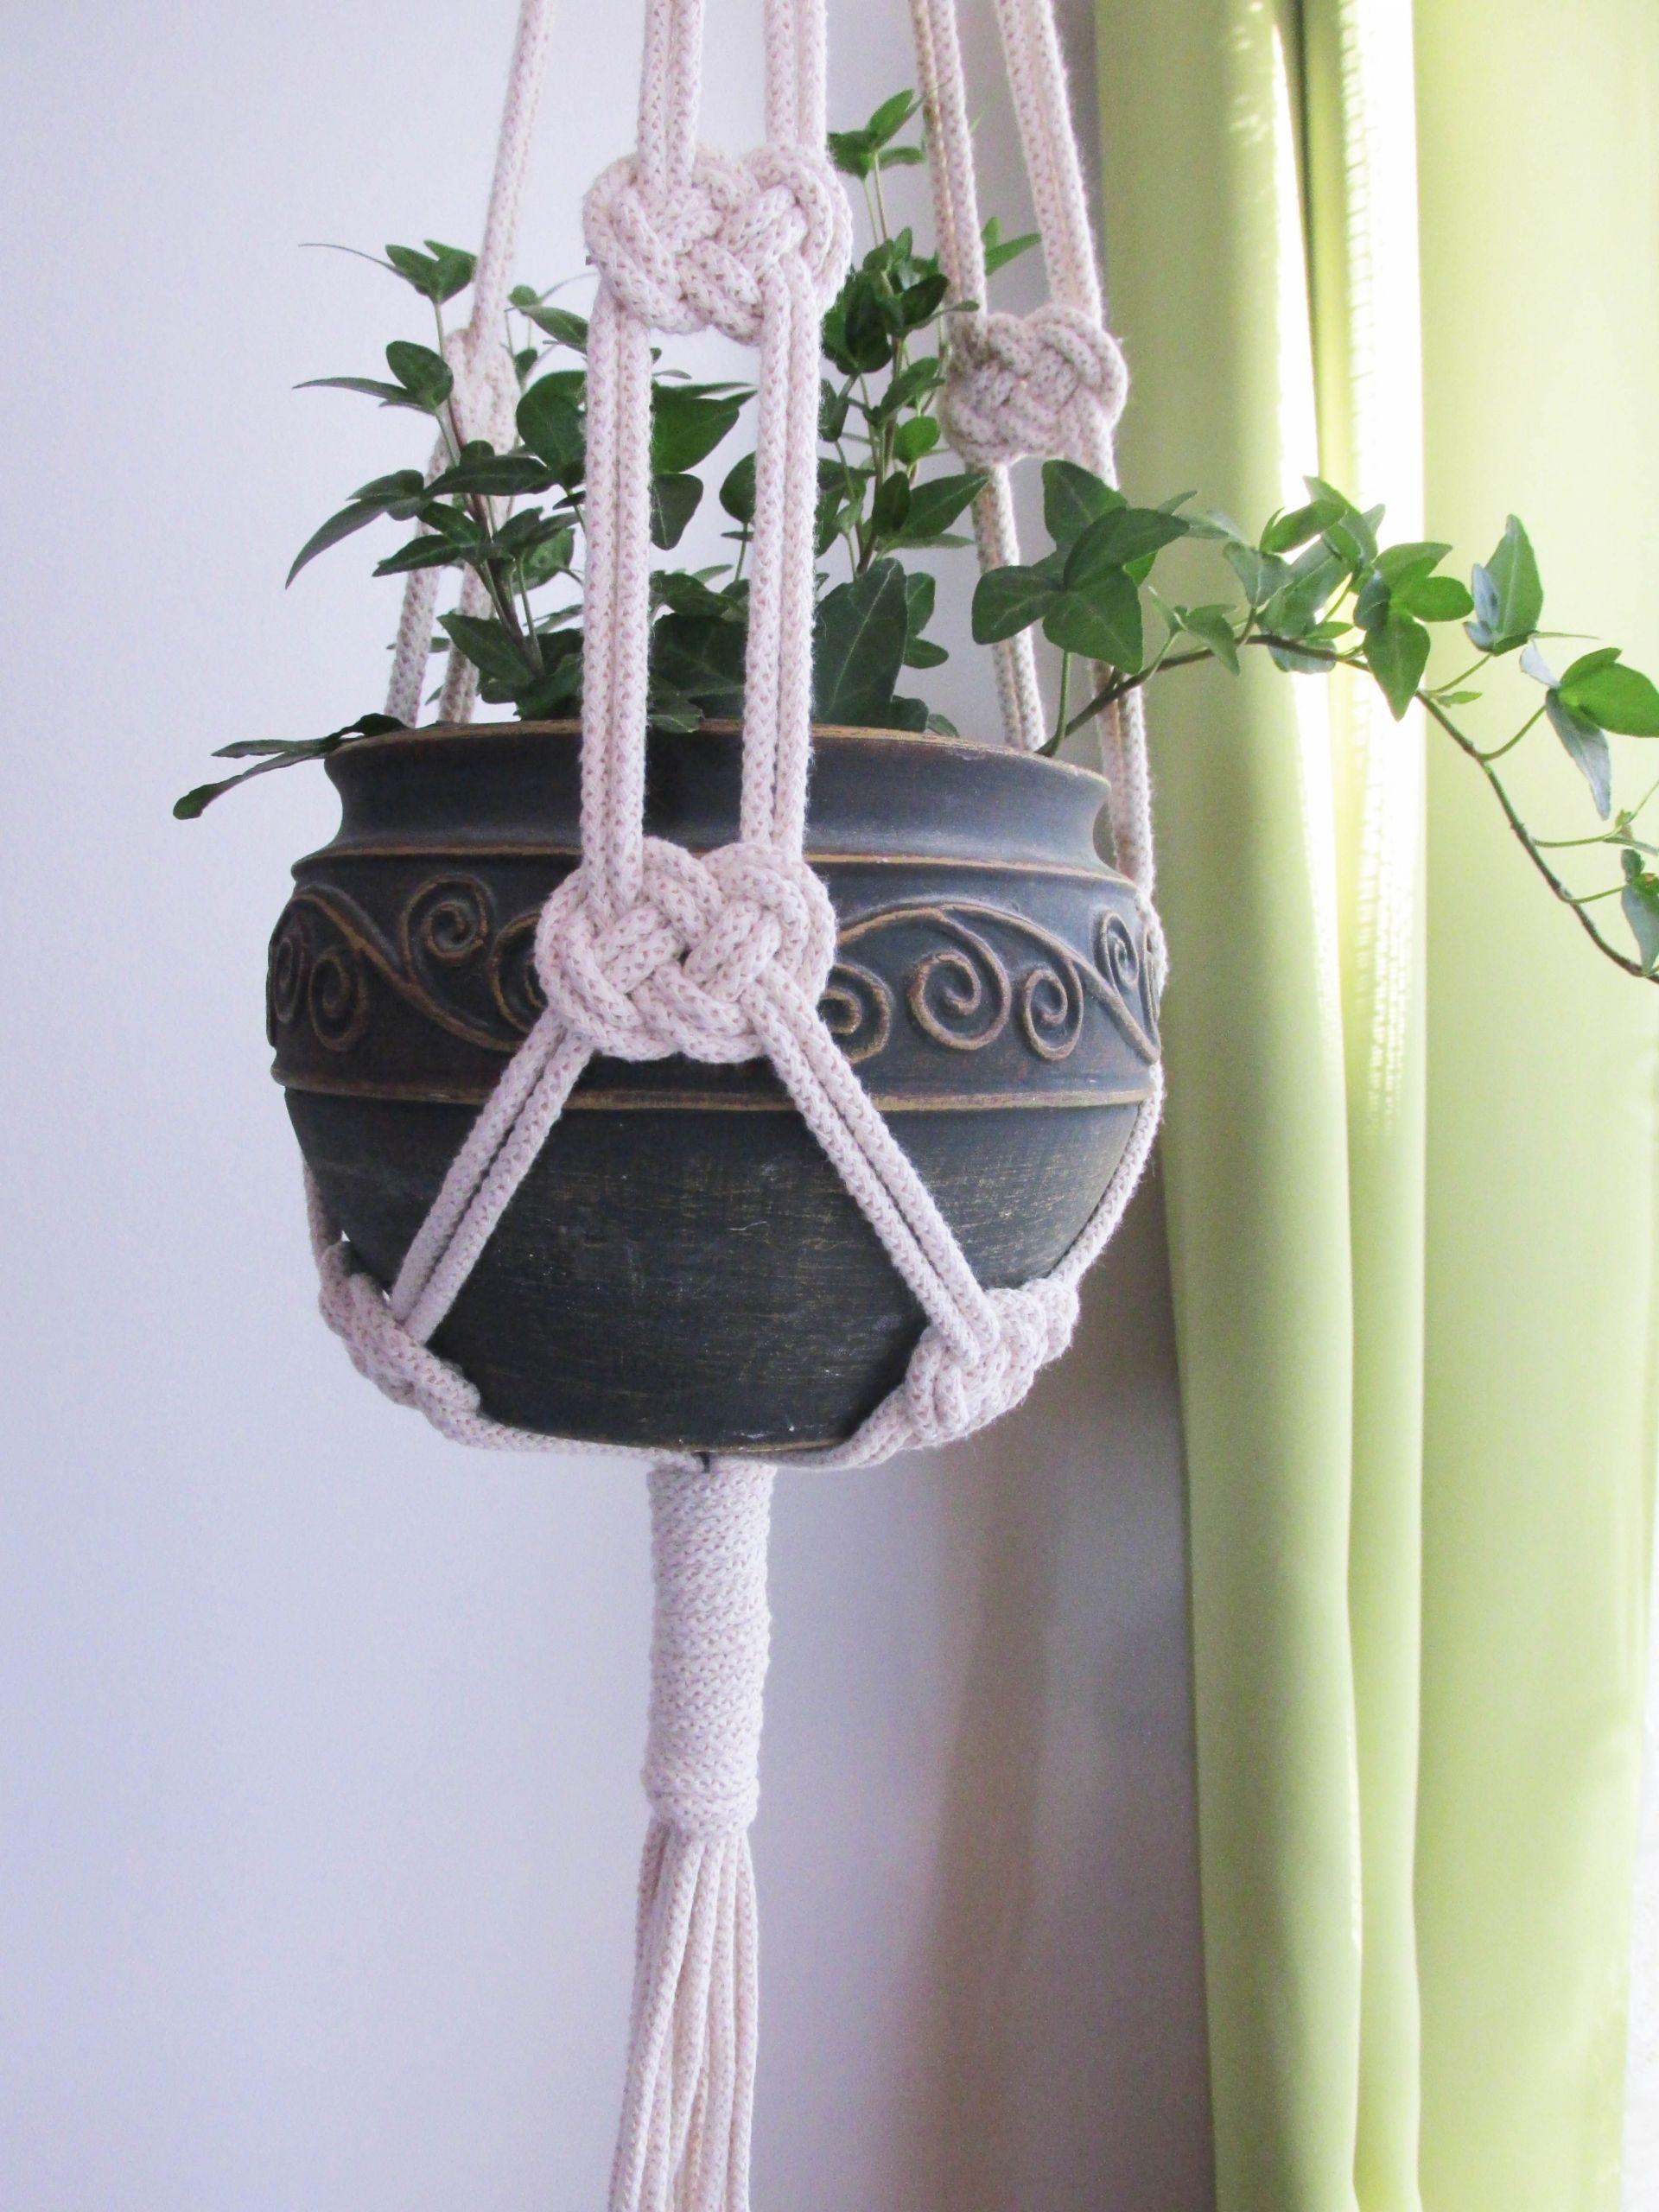 macrame gardens pinterest blumenampel selber machen blumenampel selber machen